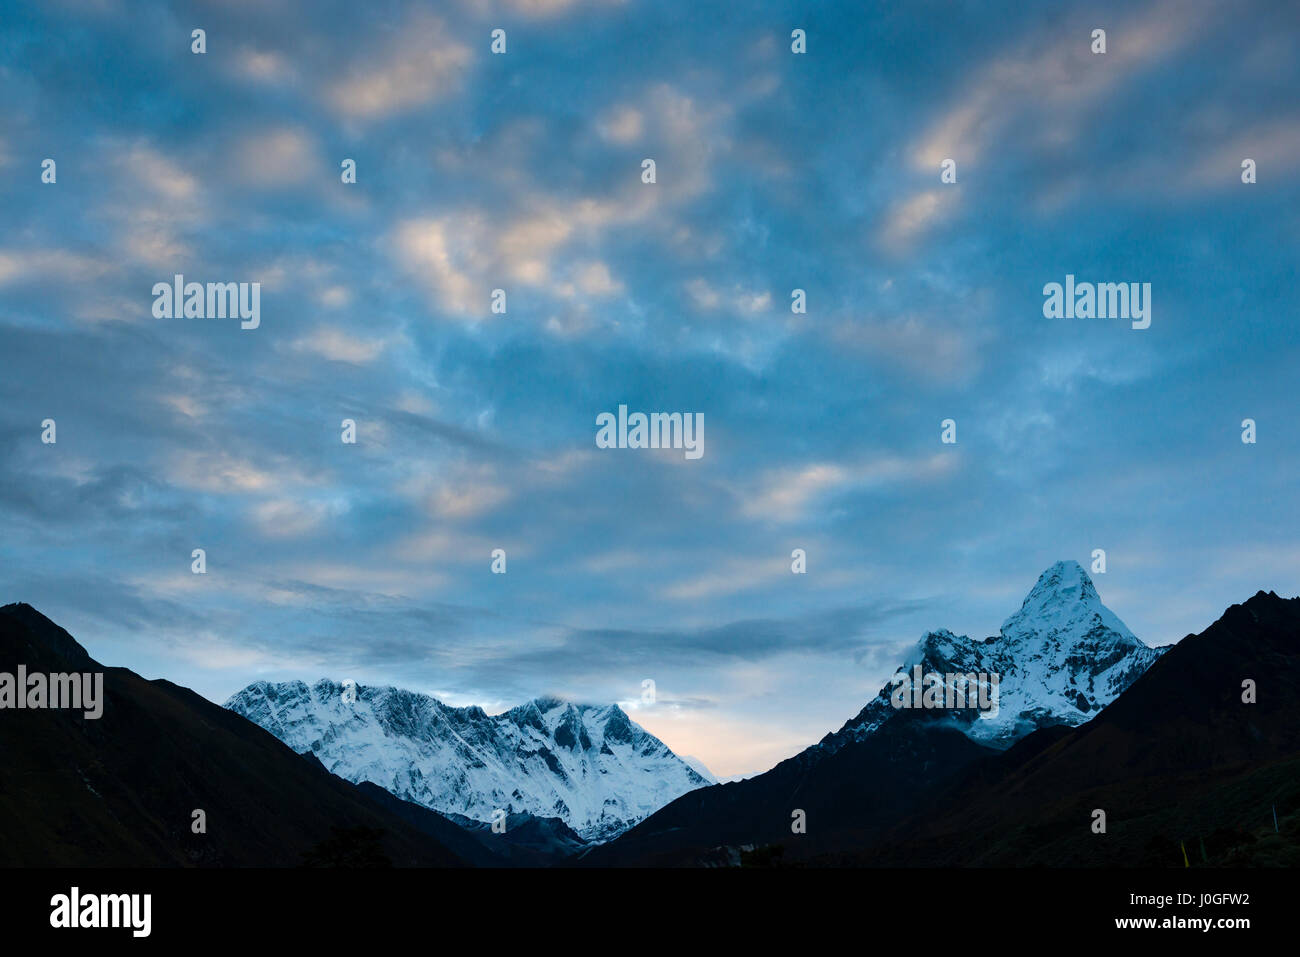 Lhotse and Ama Dablam at dawn, seen from Tengboche, Nepal. Photo © robertvansluis.com - Stock Image